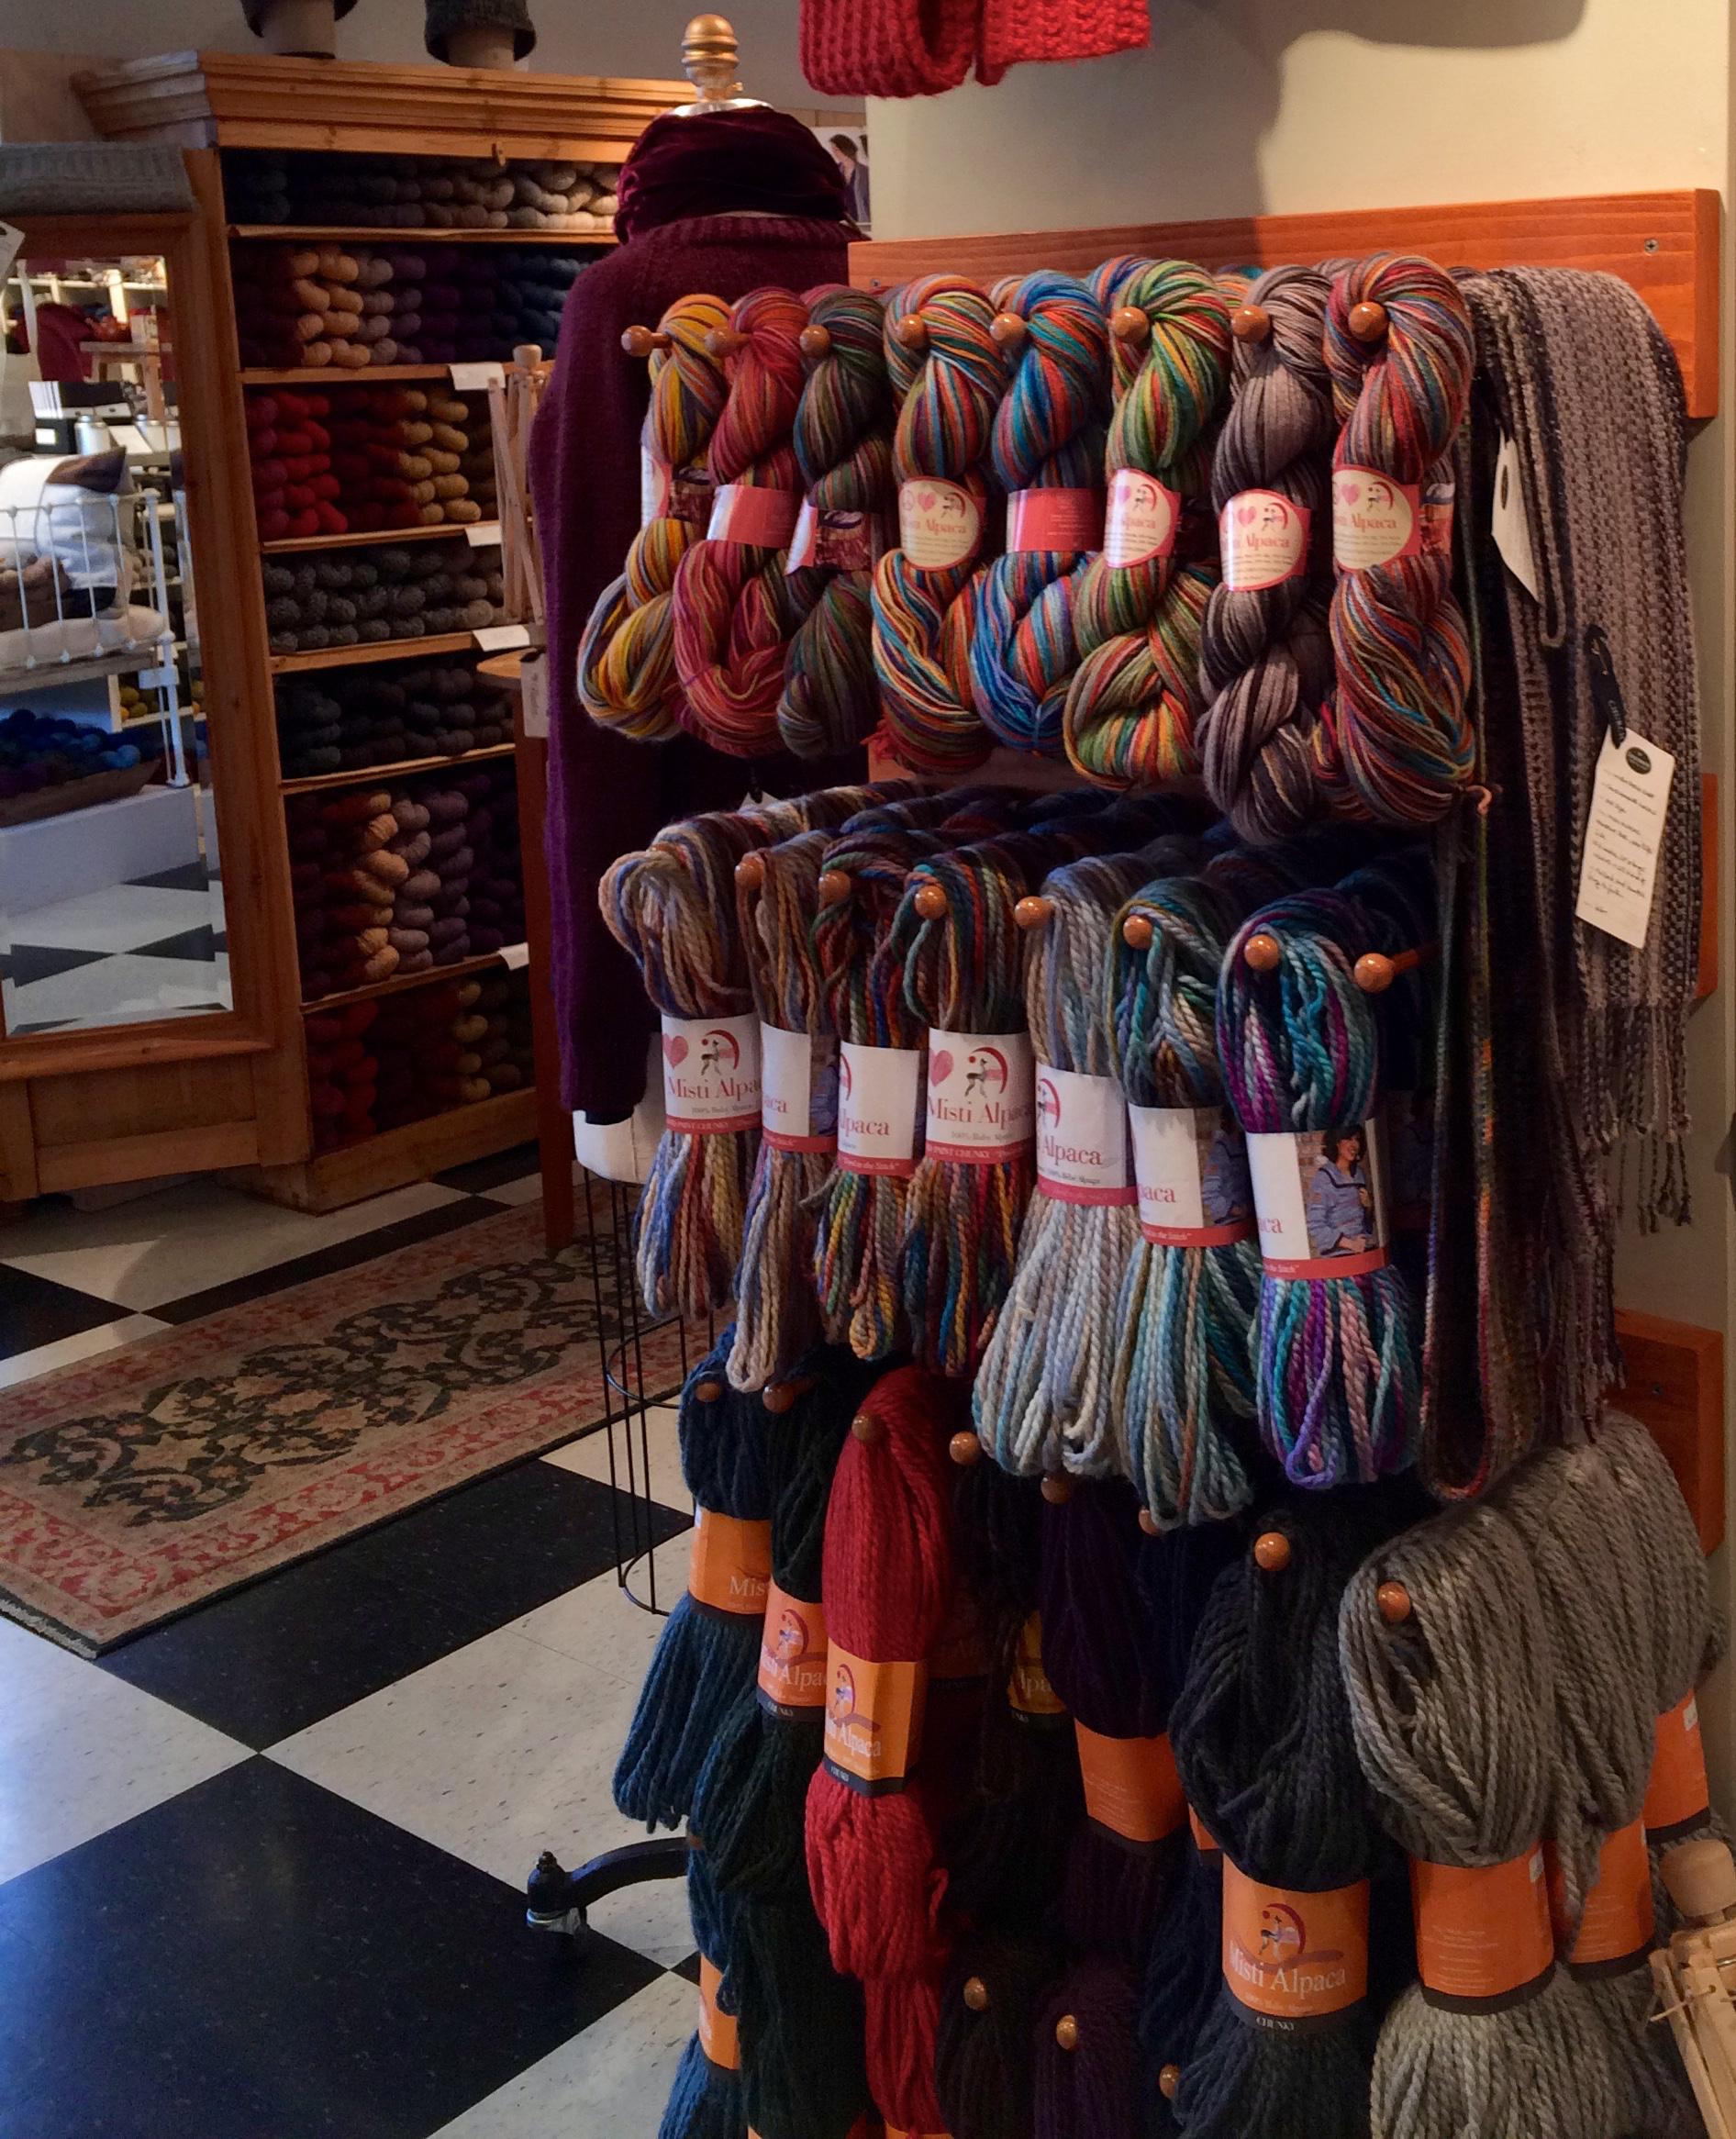 Rainbow yarn, anyone?